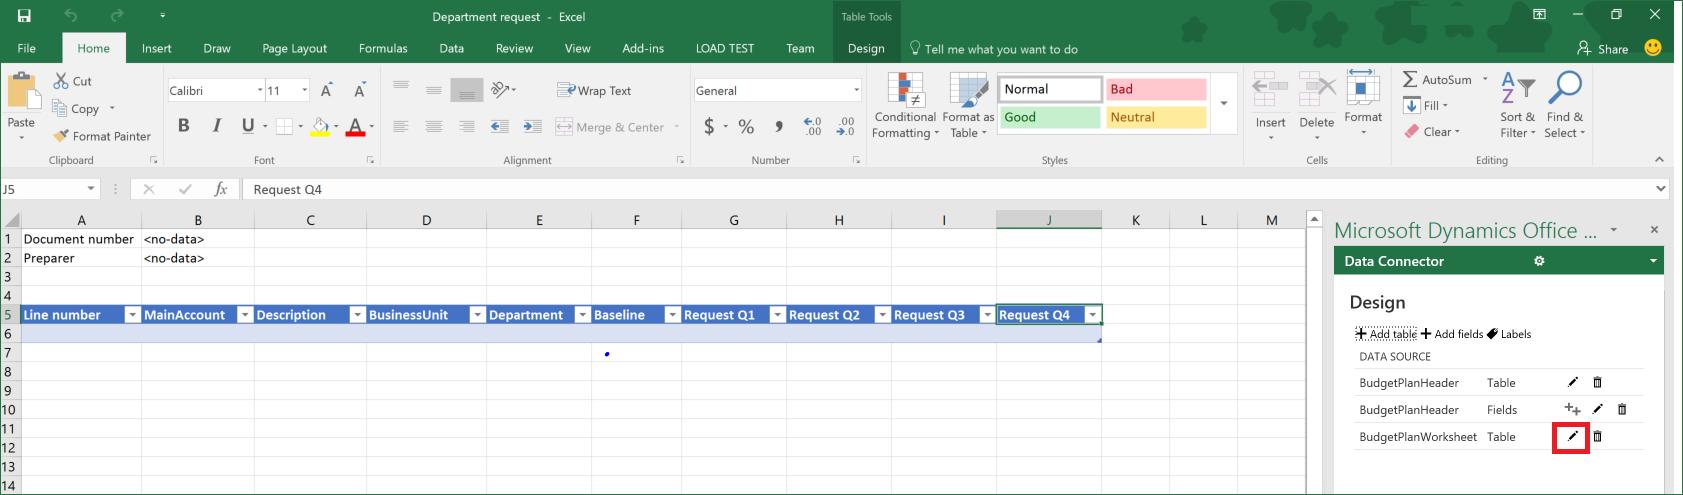 Budgetplanungsvorlagen Fur Excel Finance Dynamics 365 Microsoft Docs